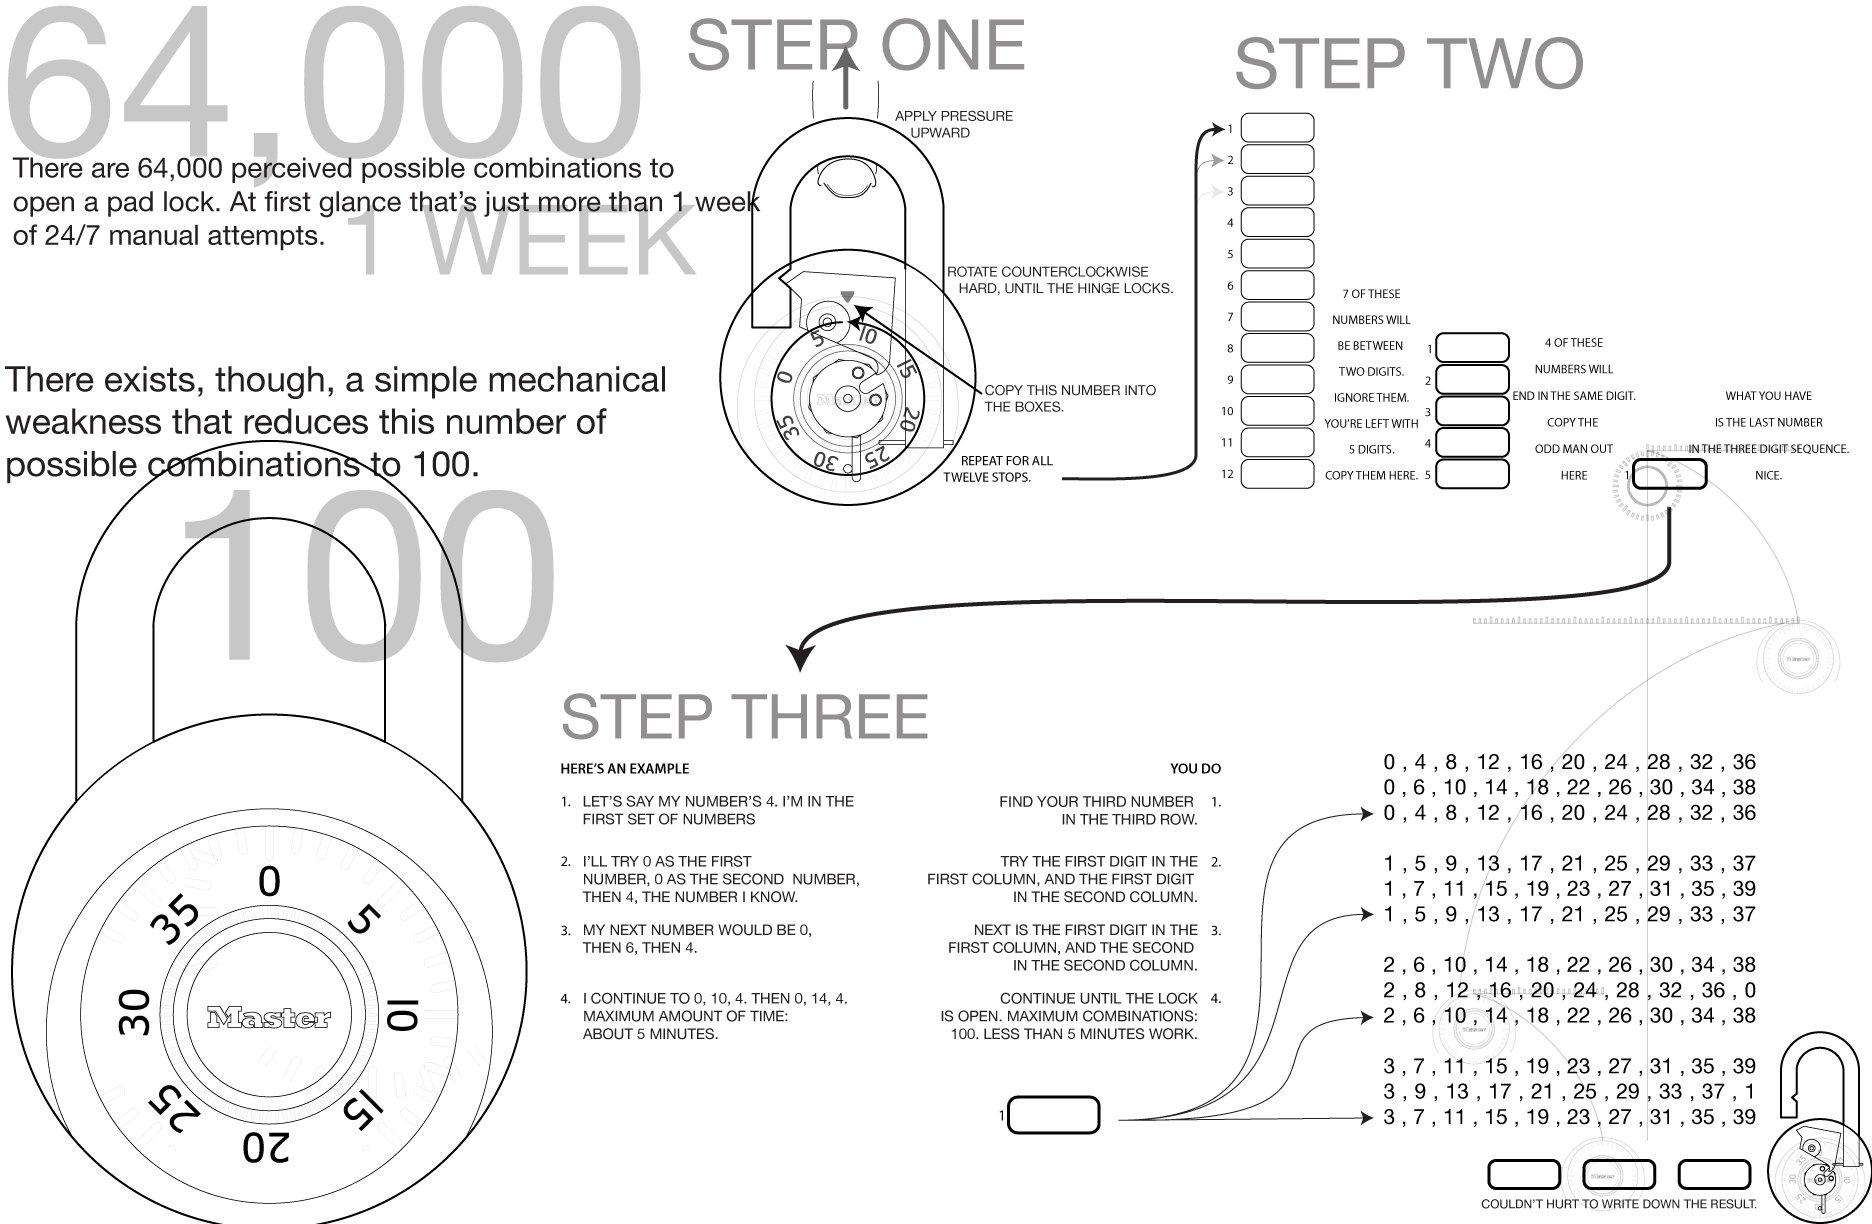 mosler safe combination change instructions